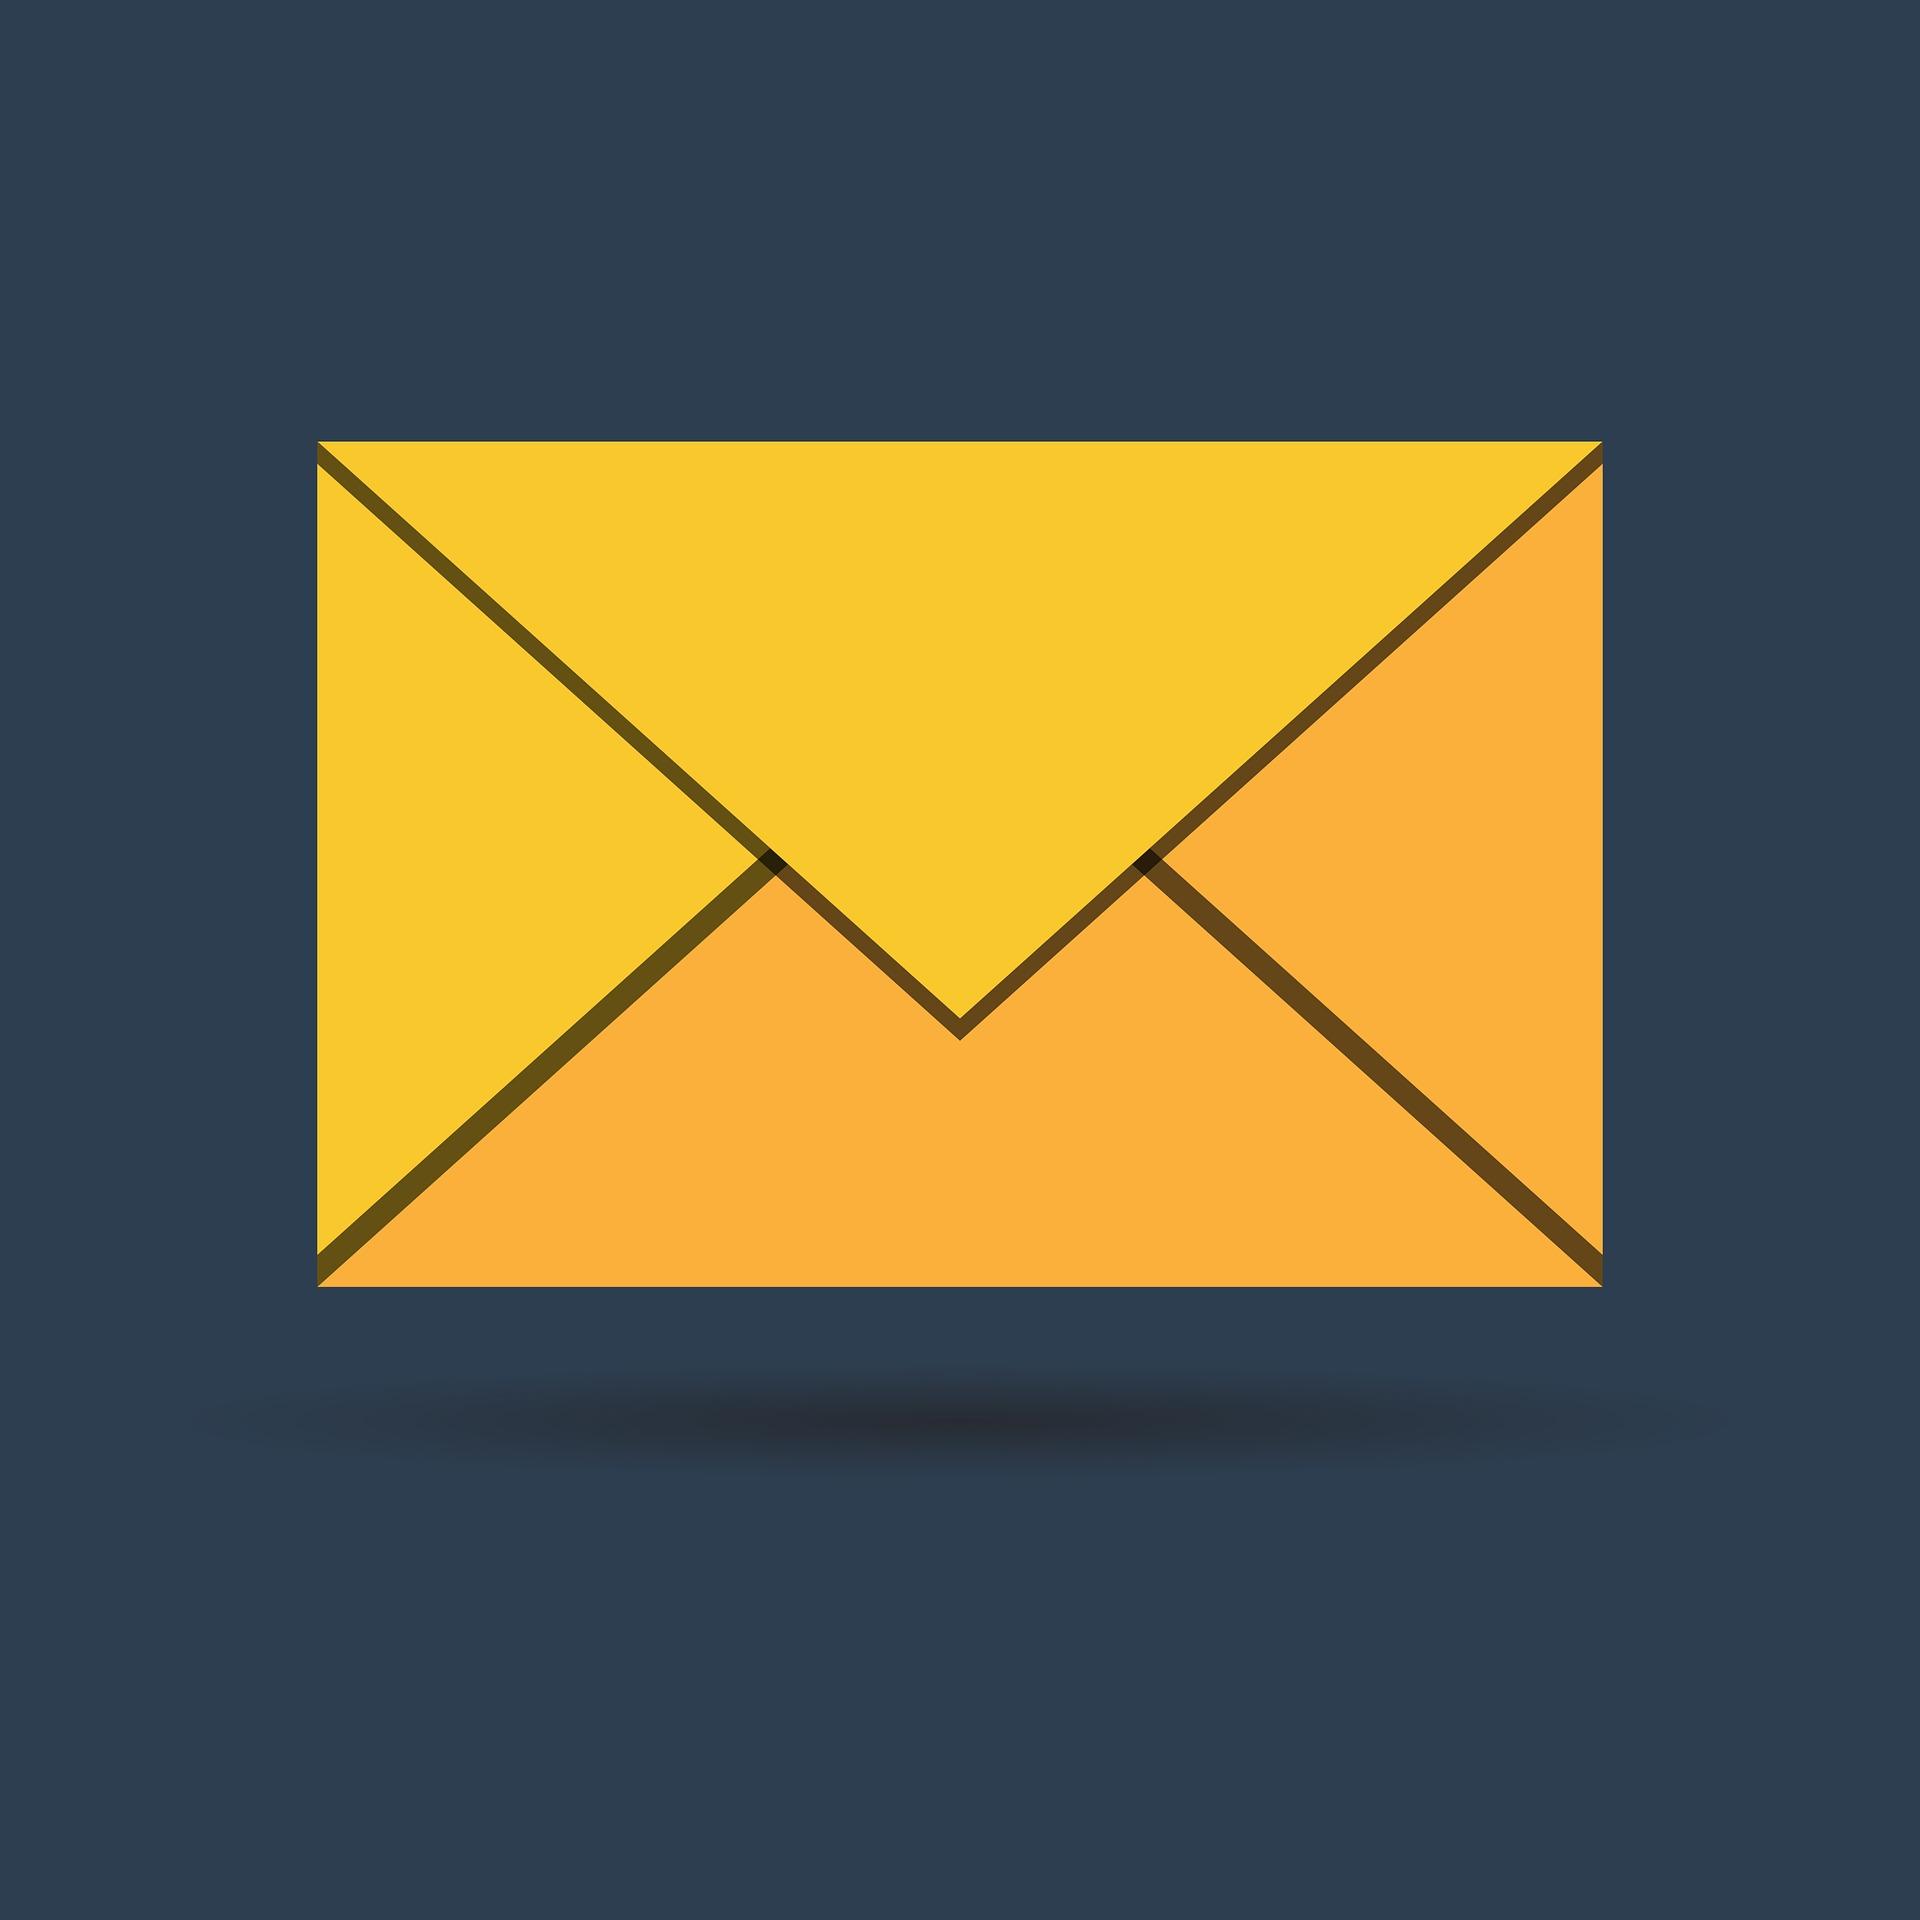 envelope-2173634_1920.jpg